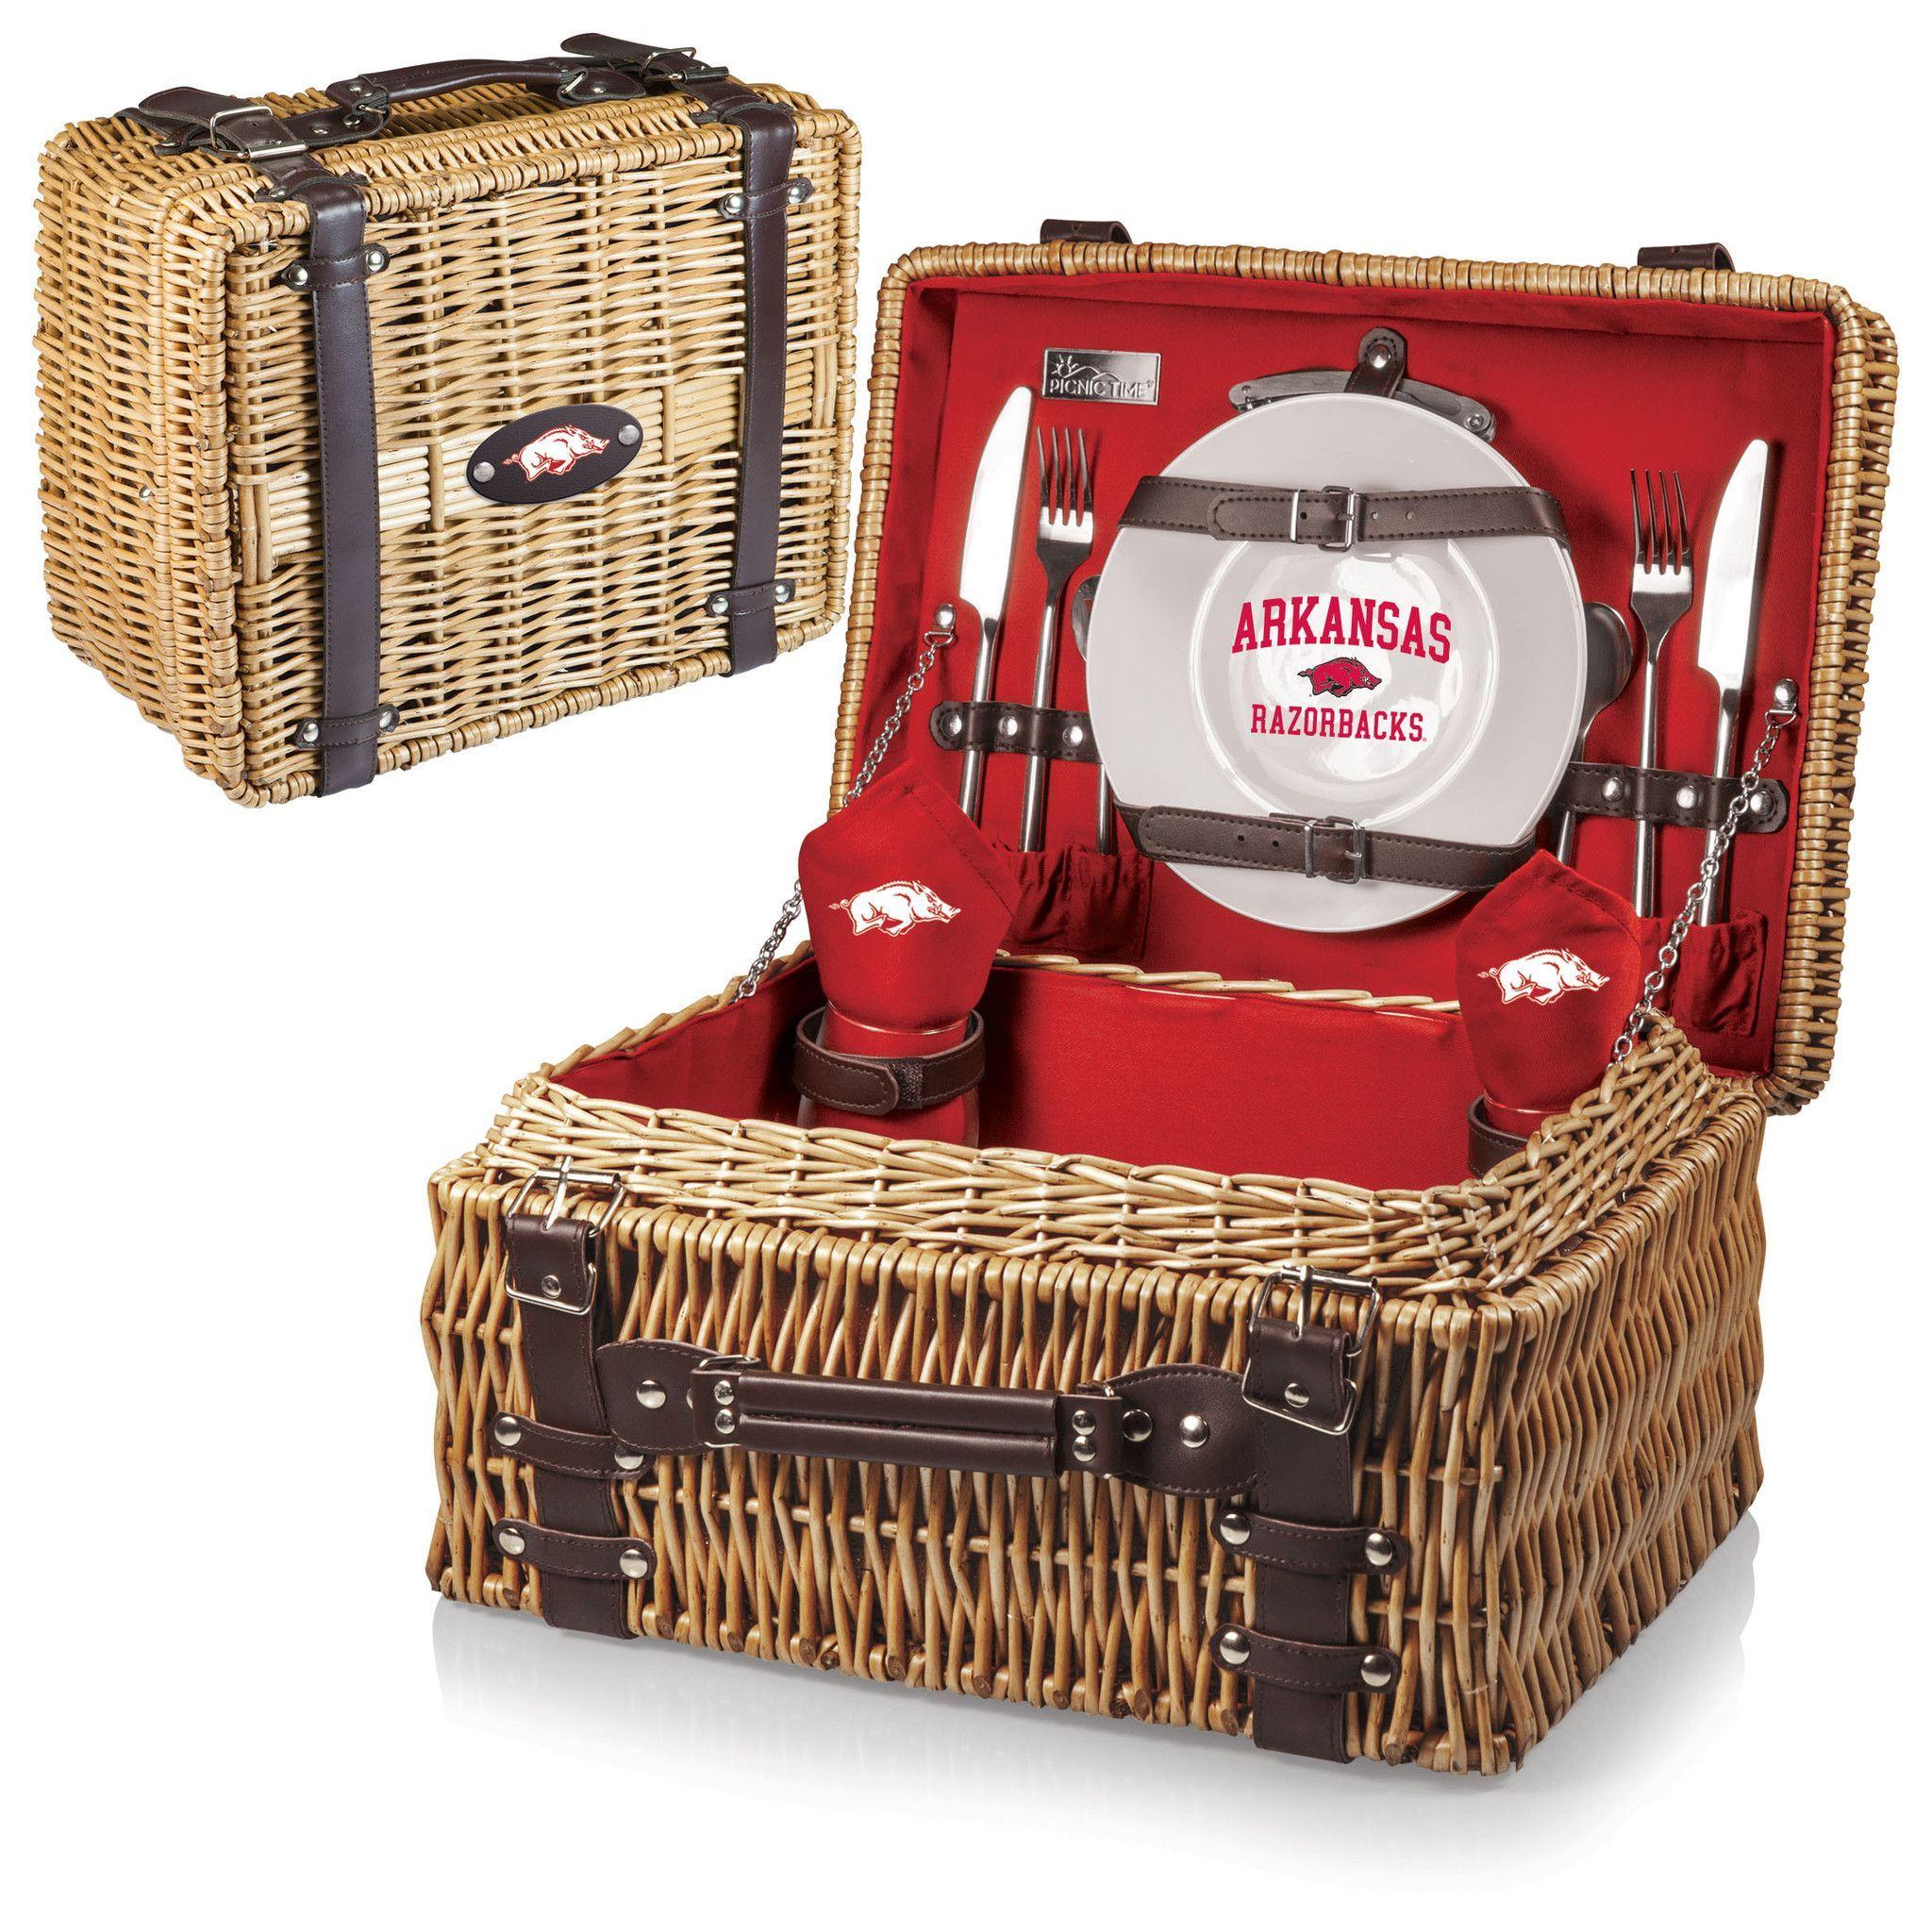 Arkansas Razorbacks Picnic Basket With Service For 2 Picnic Basket Picnic Time Hand Blown Wine Glasses